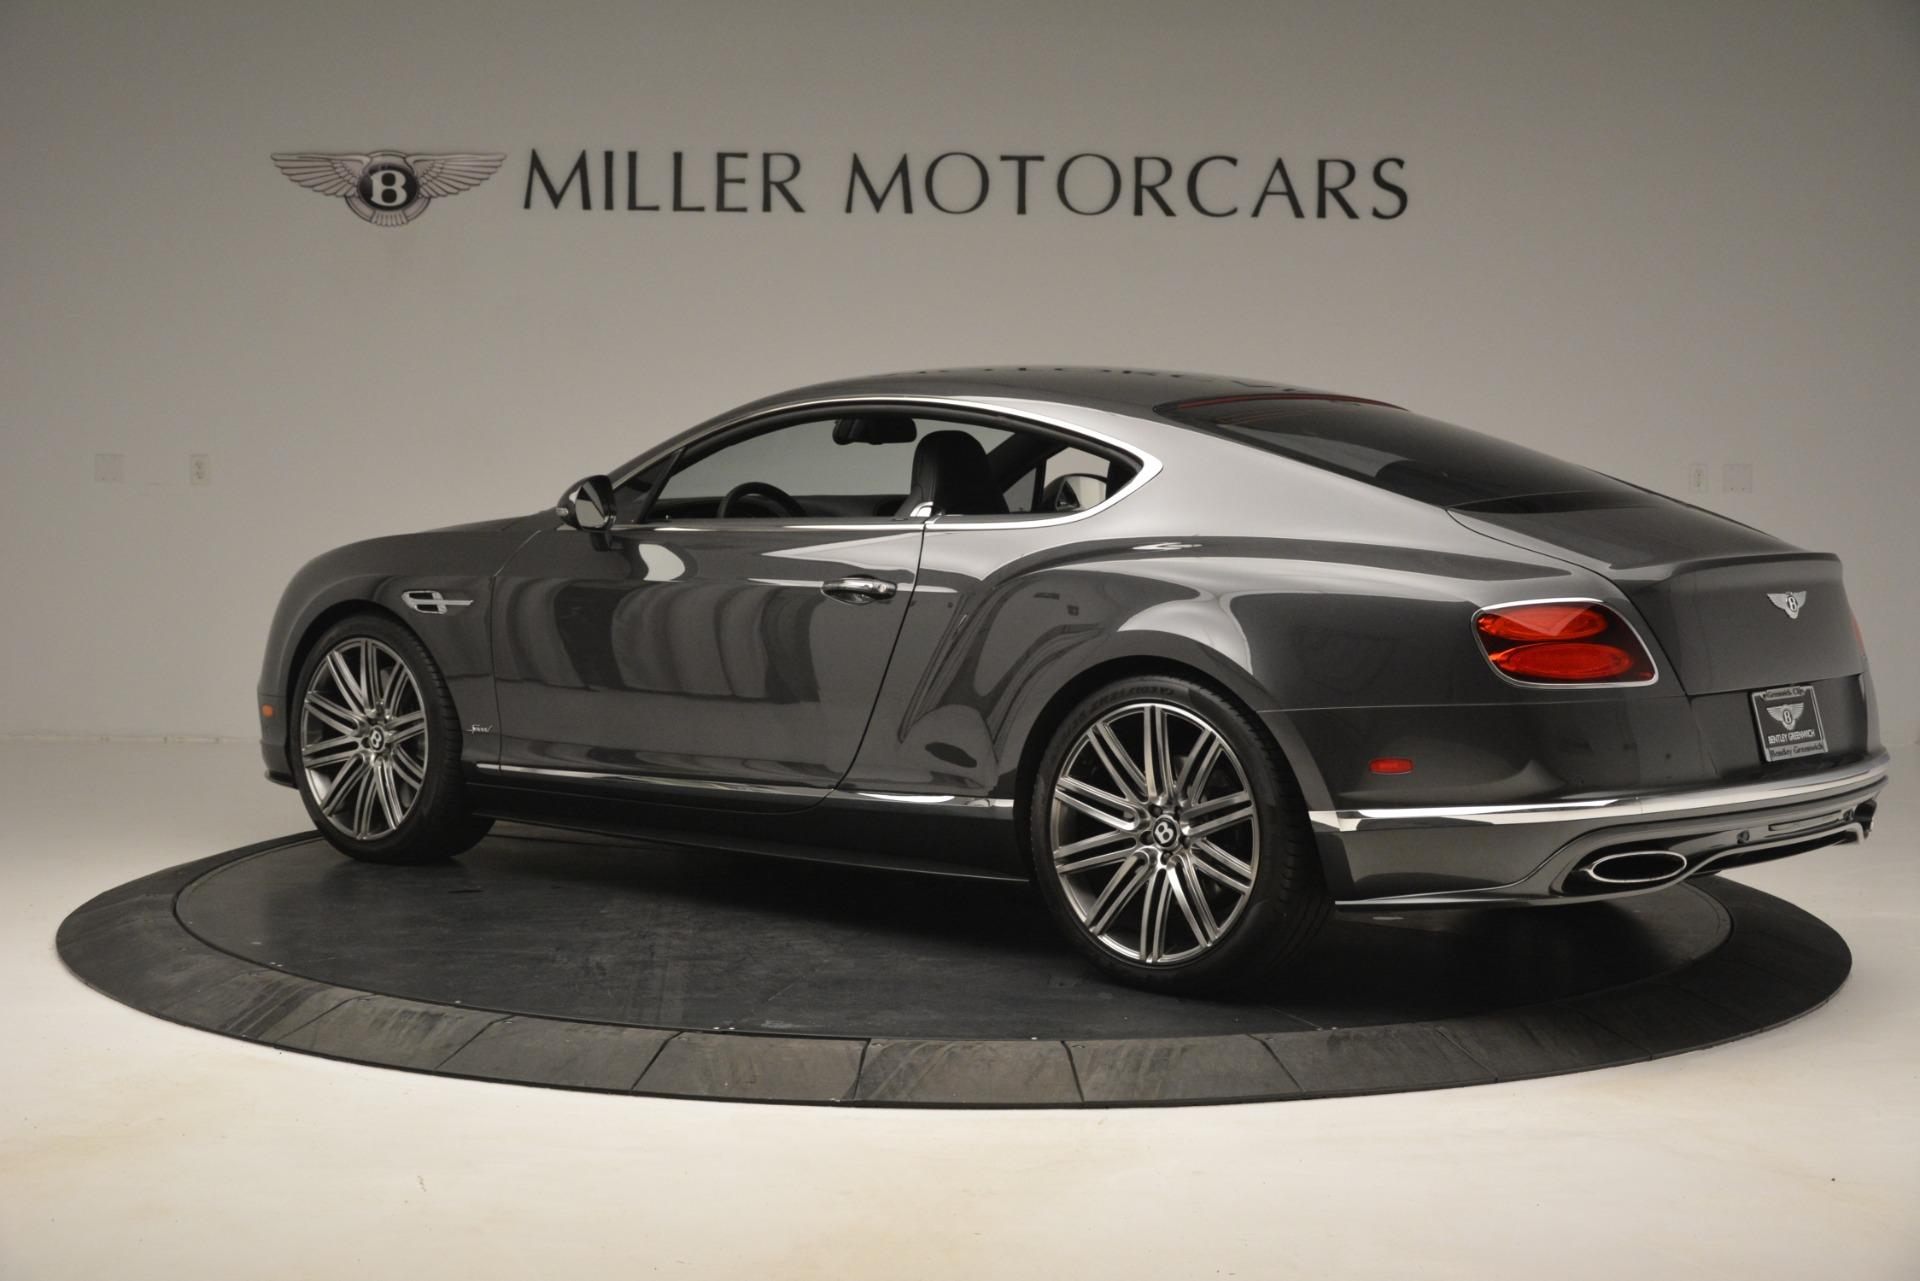 Used 2016 Bentley Continental GT Speed For Sale In Westport, CT 2953_p4